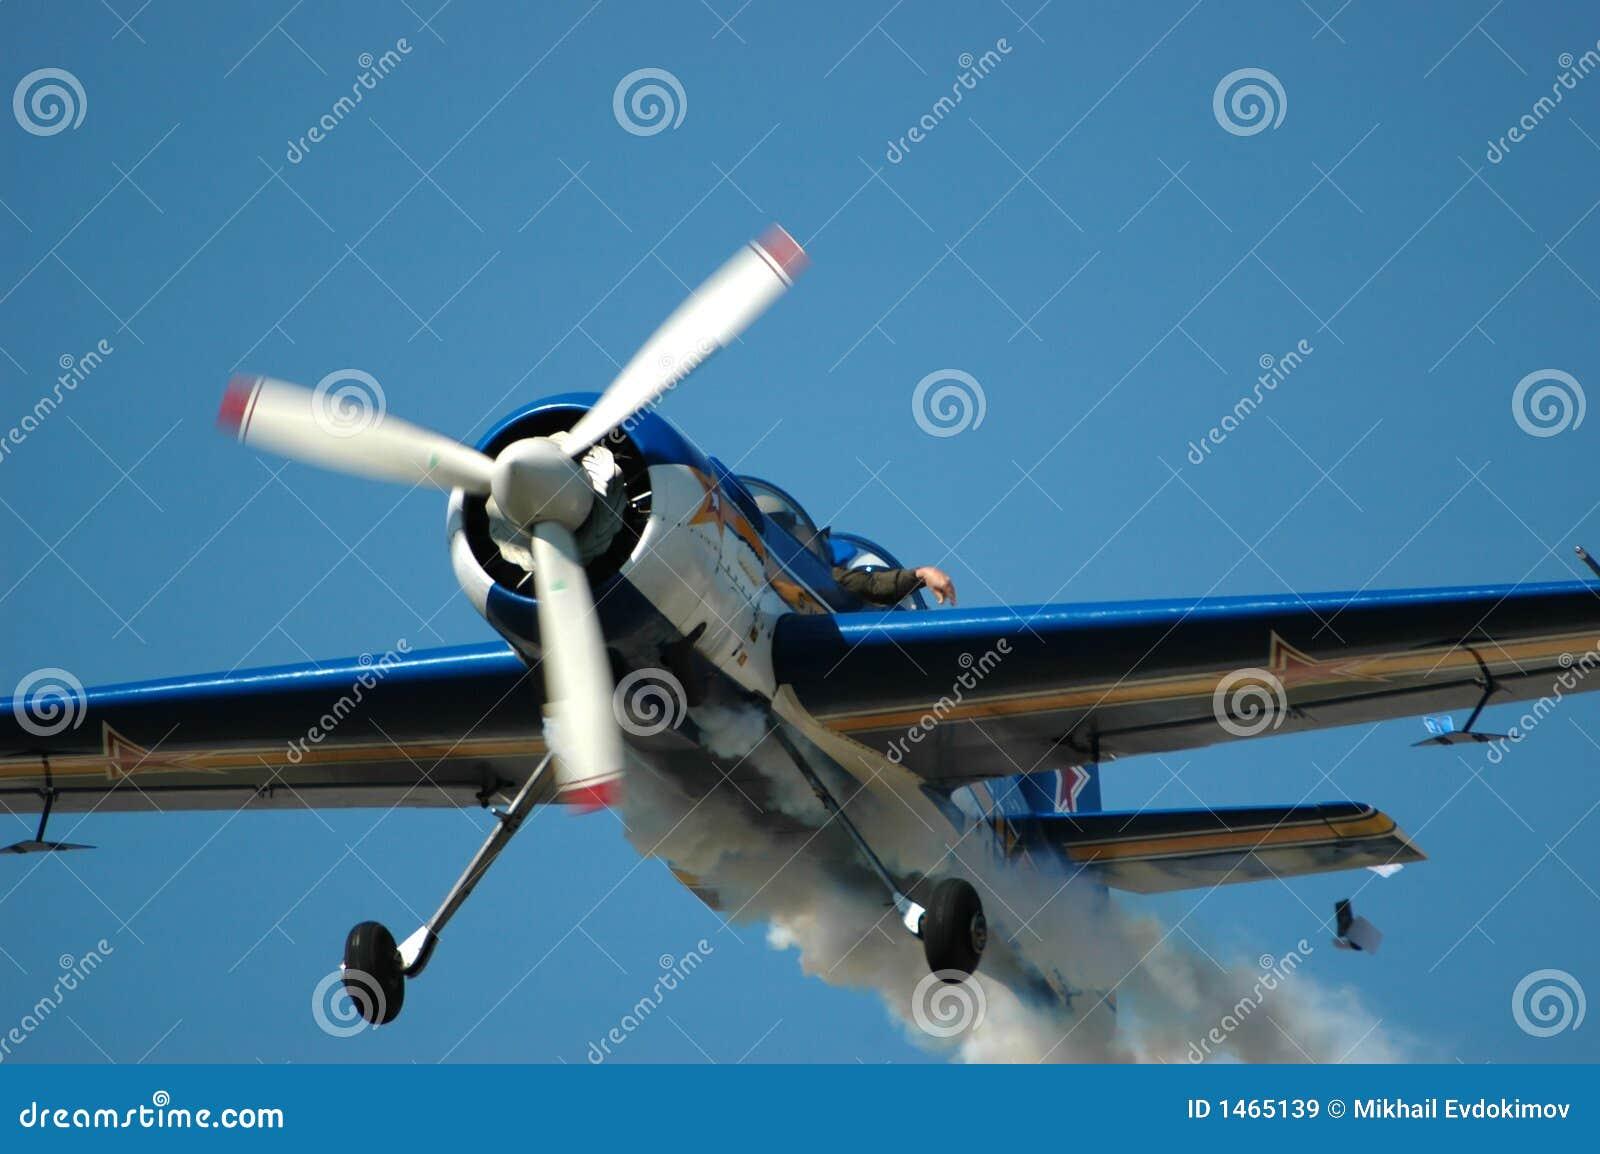 russian sports aircraft sukhoi su 29 in flight royalty free stock